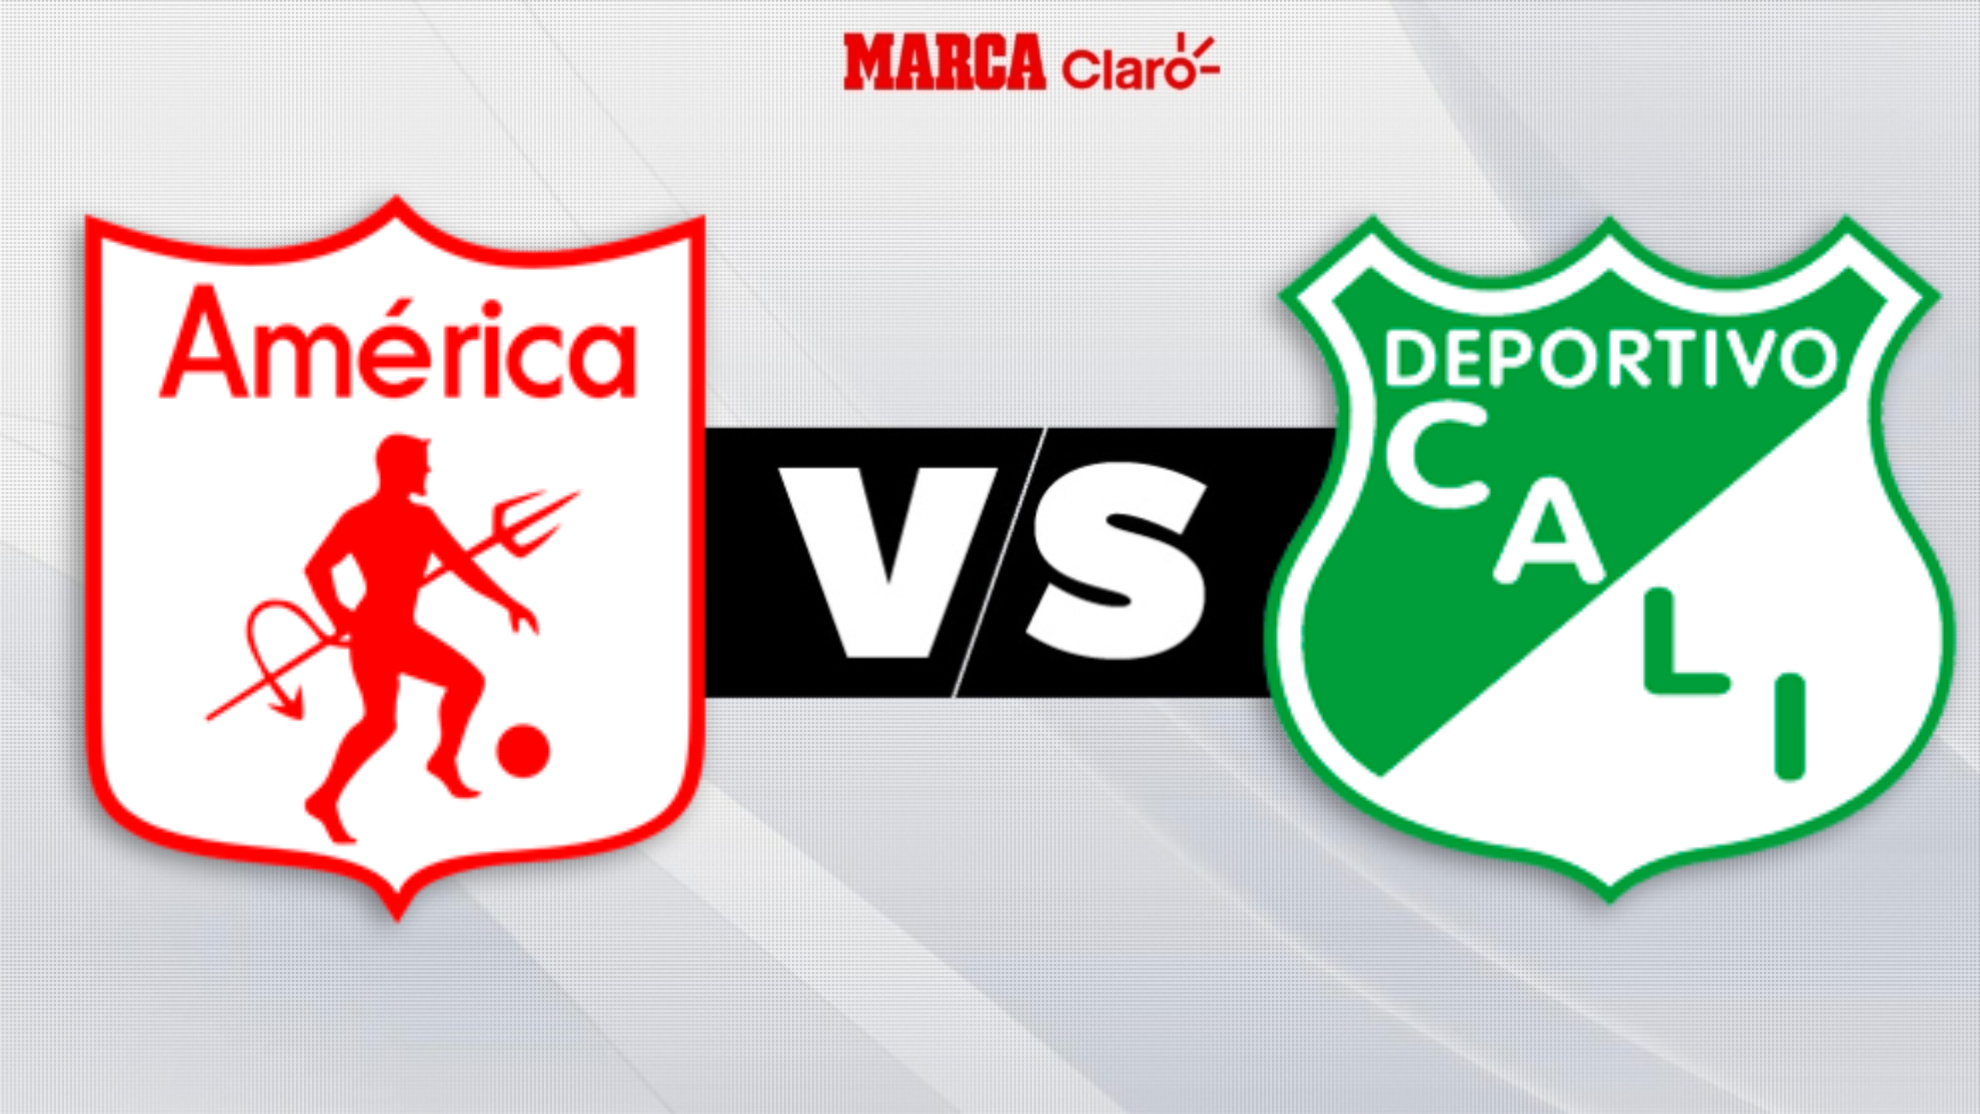 América vs Deportivo Cali, liga colombiana en directo.